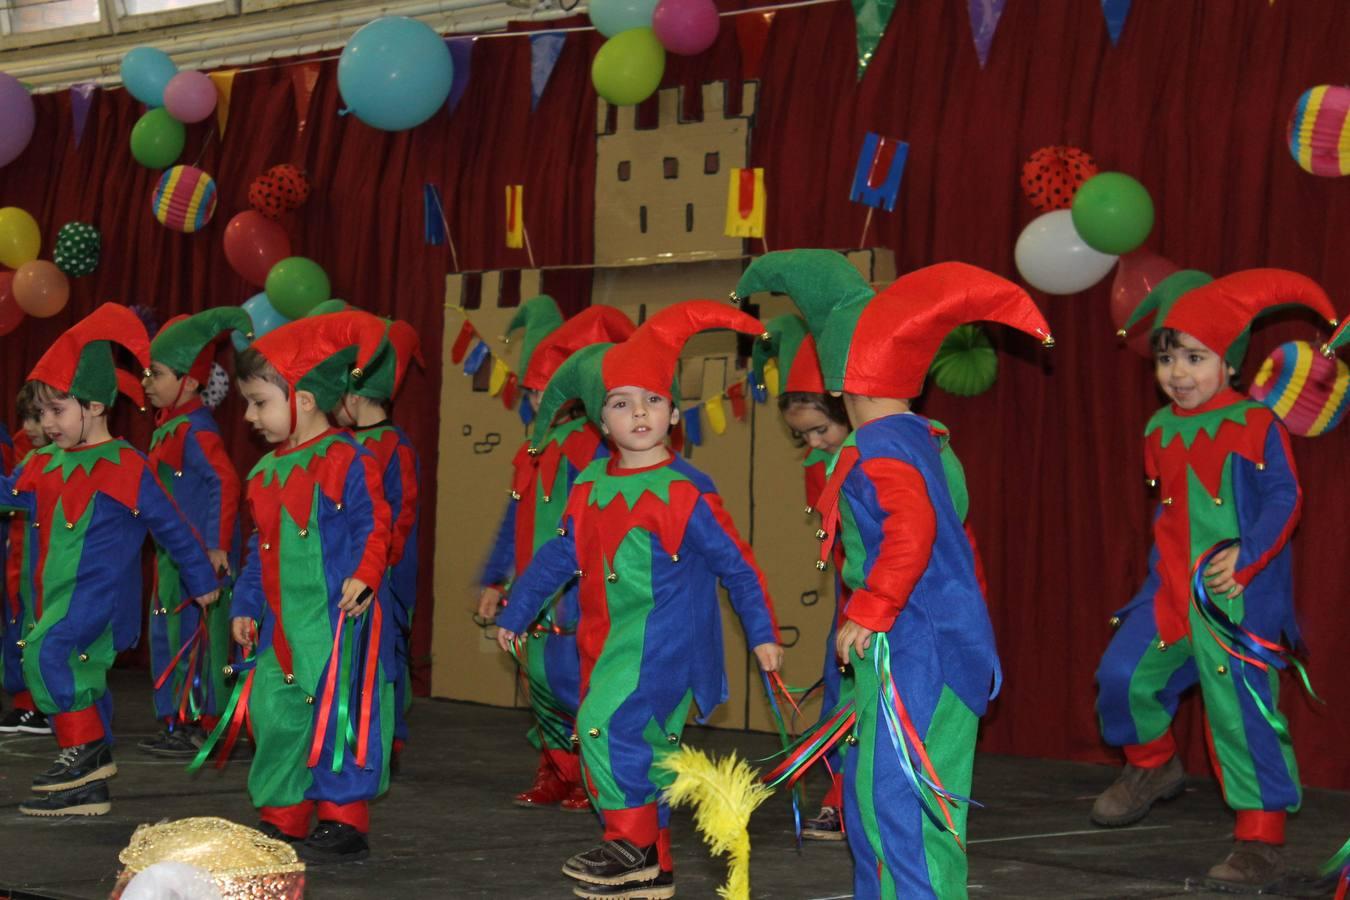 Los colegios gijoneses celebran el Carnaval